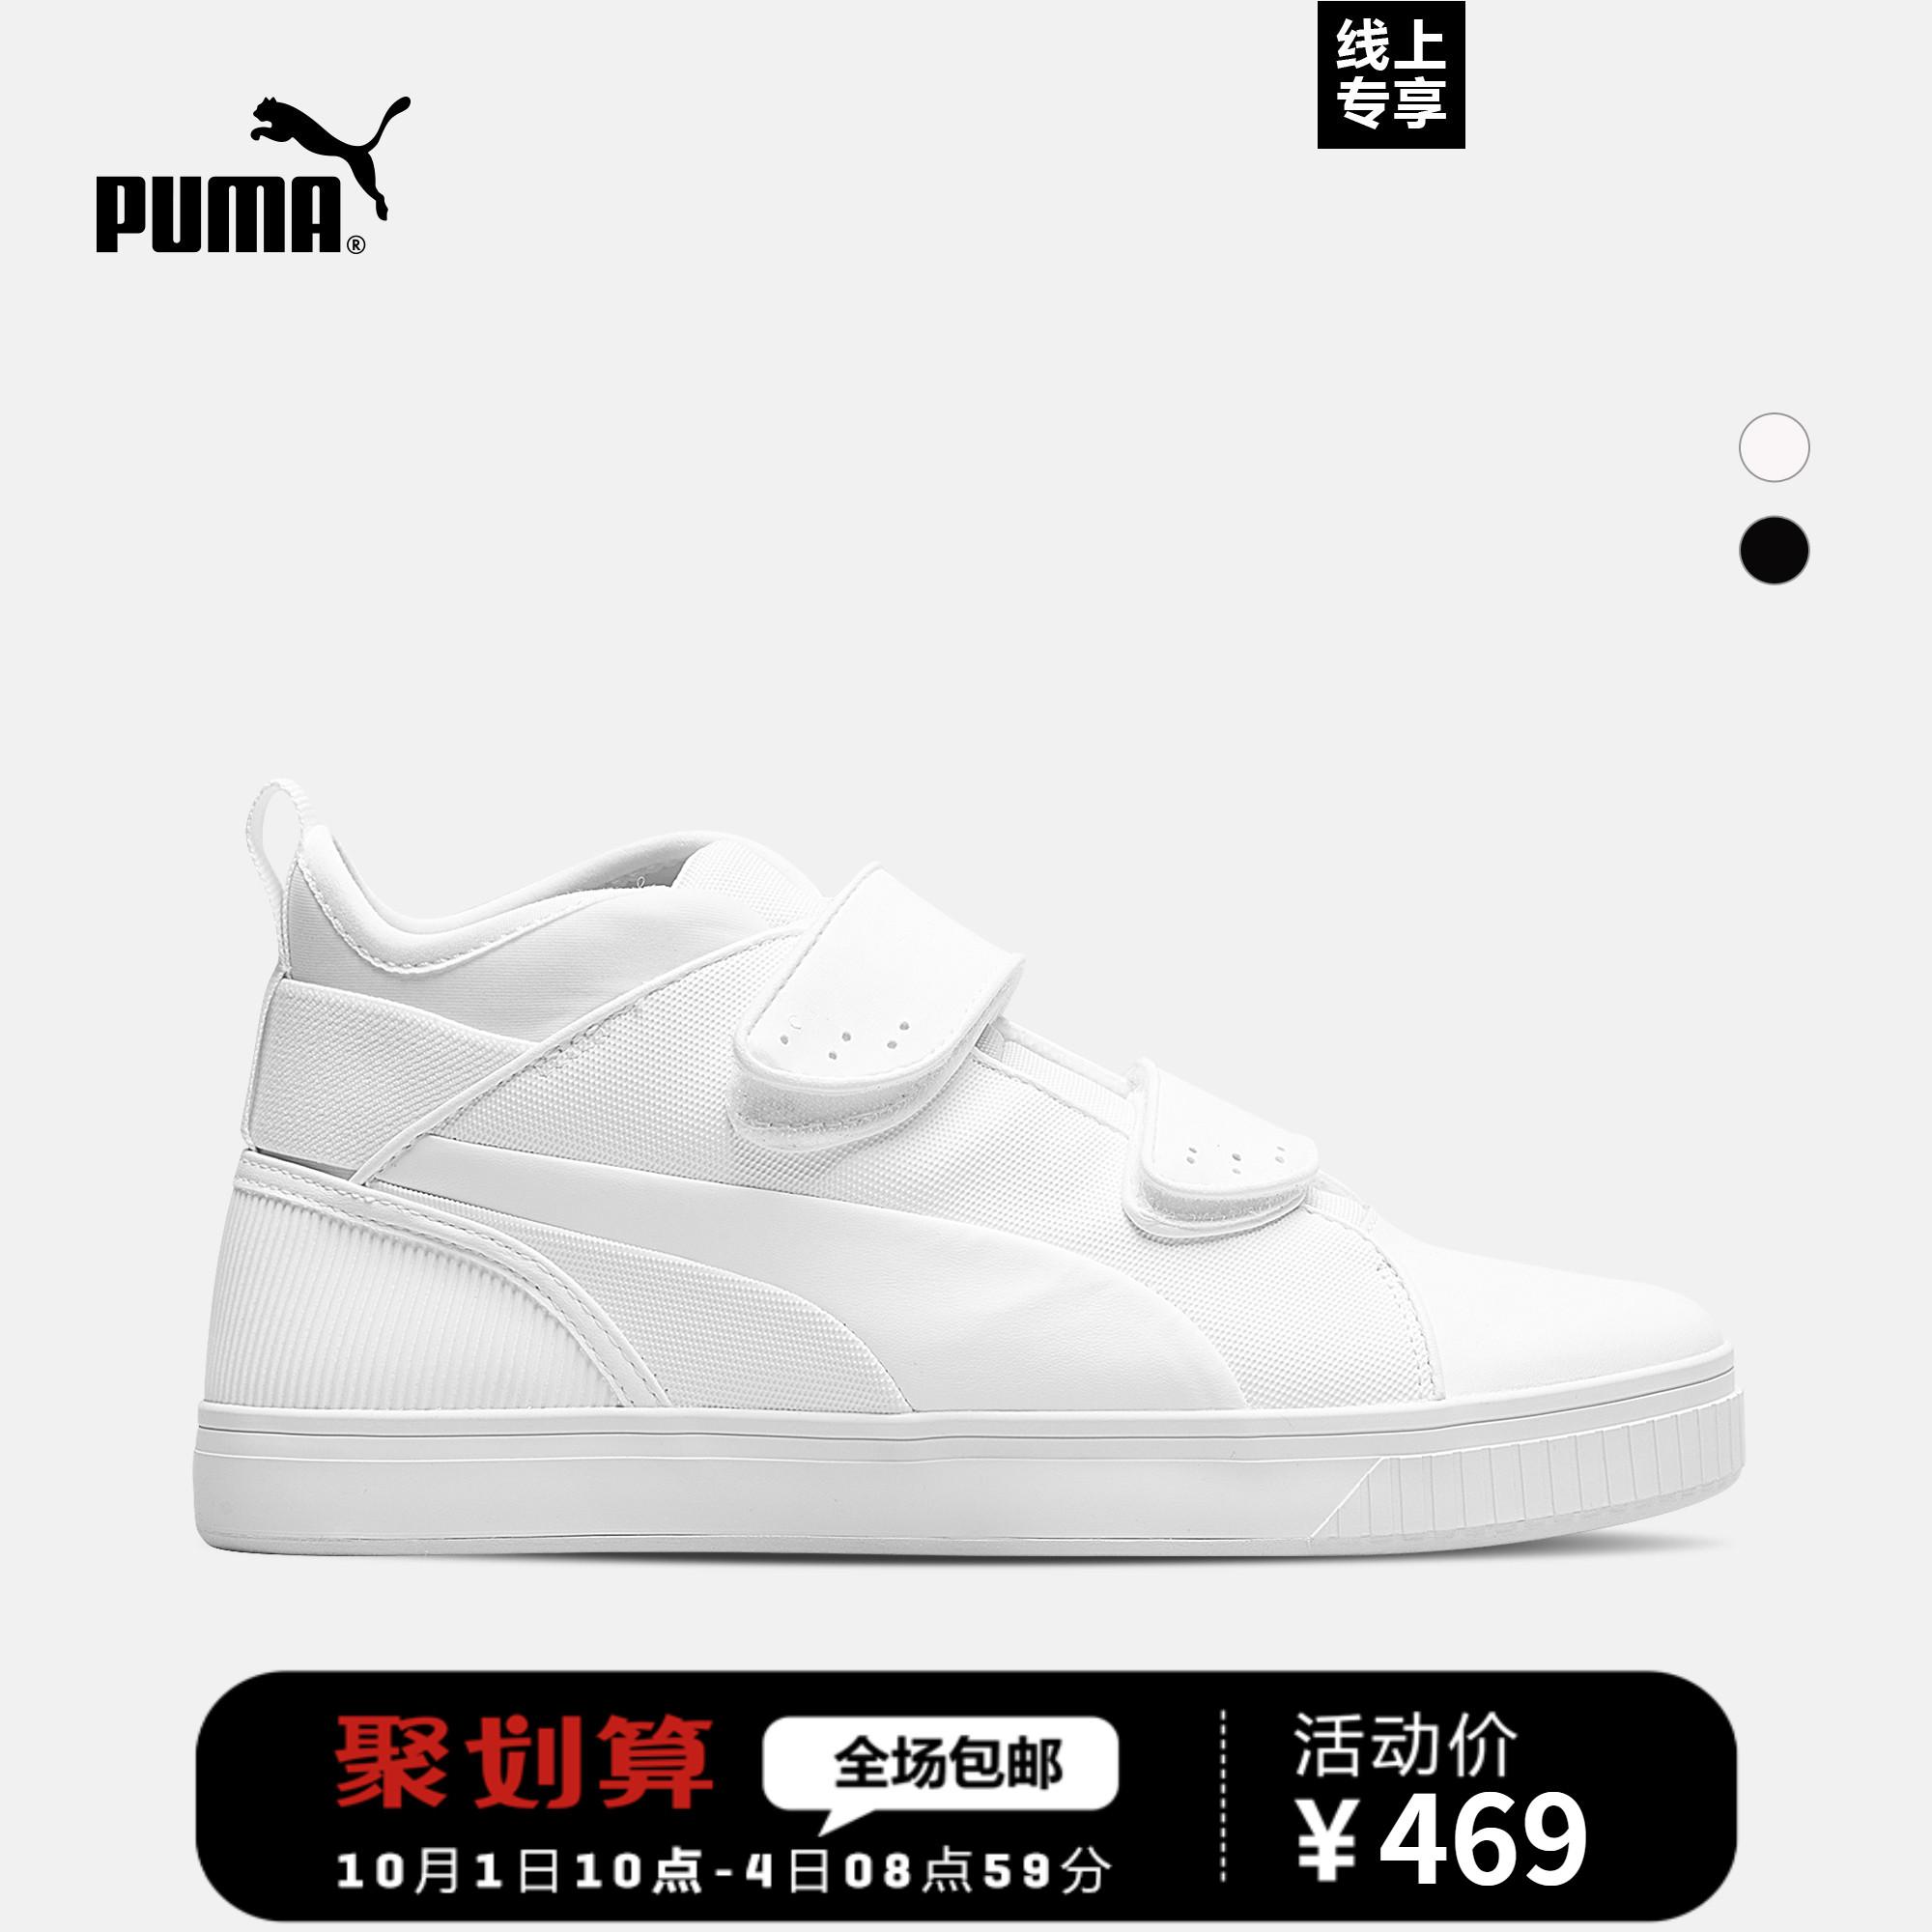 PUMA彪马官方 男女同款运动休闲鞋 Play Strap 362563